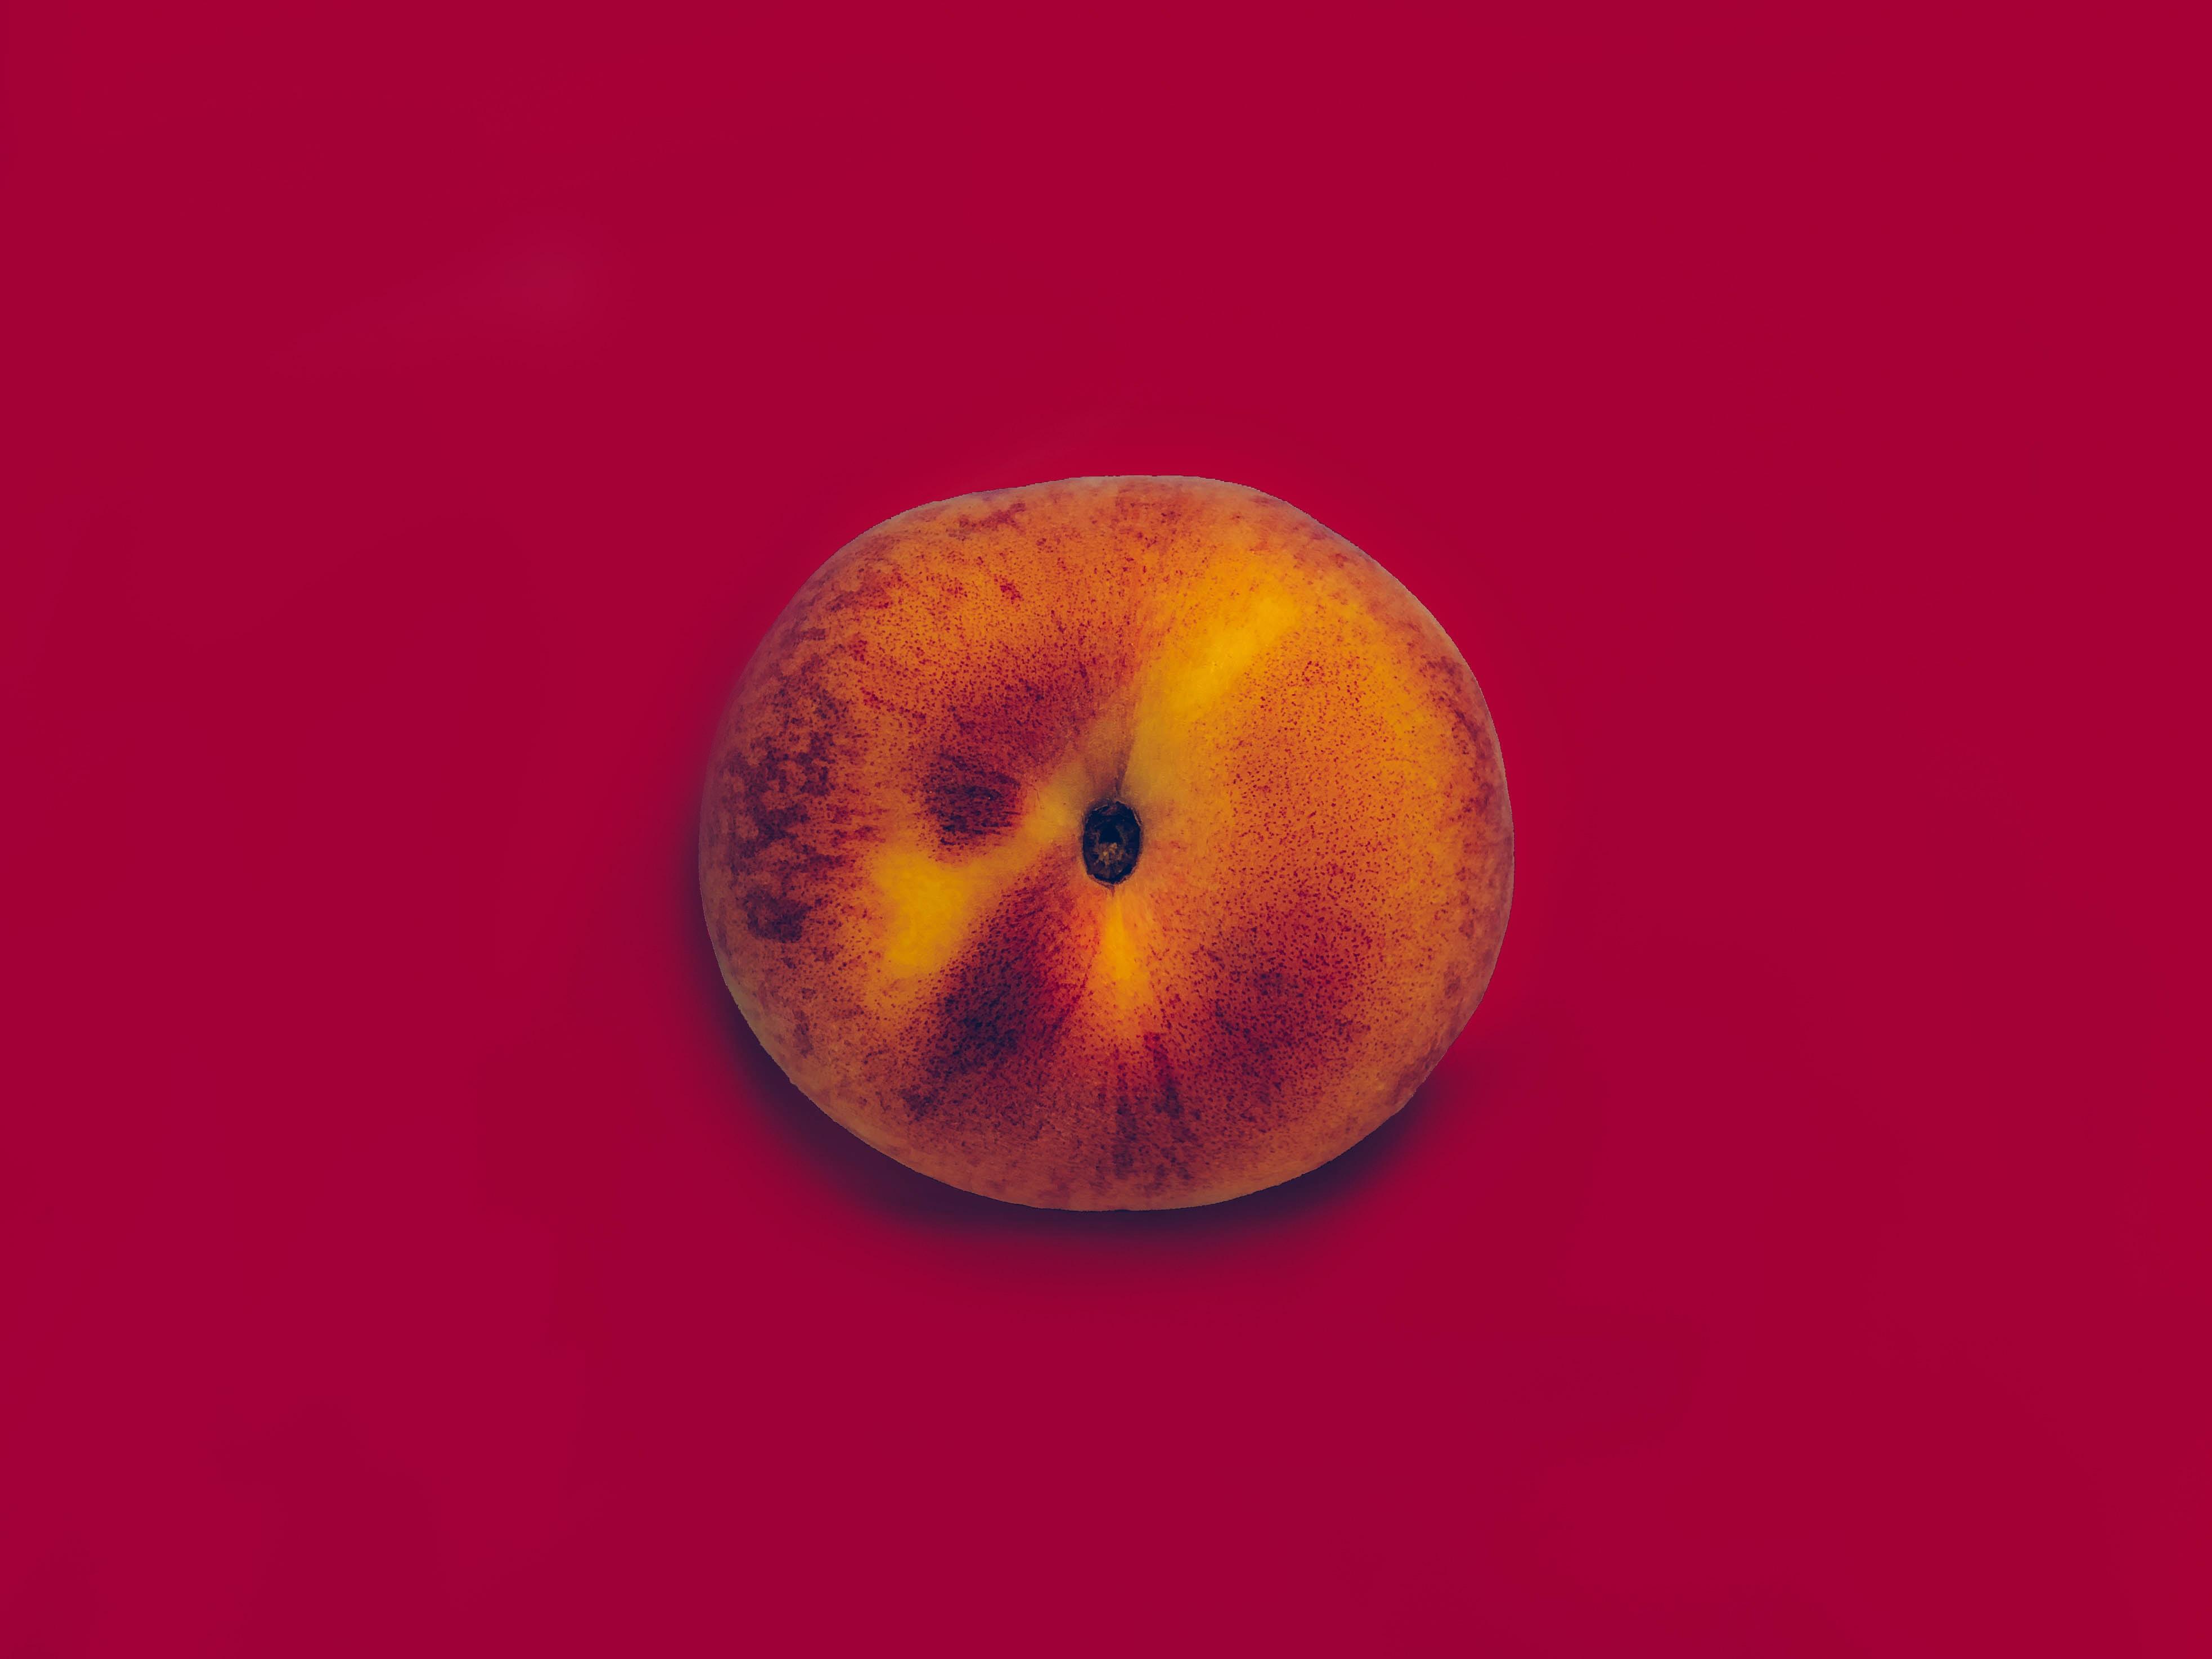 round apple fruit candle